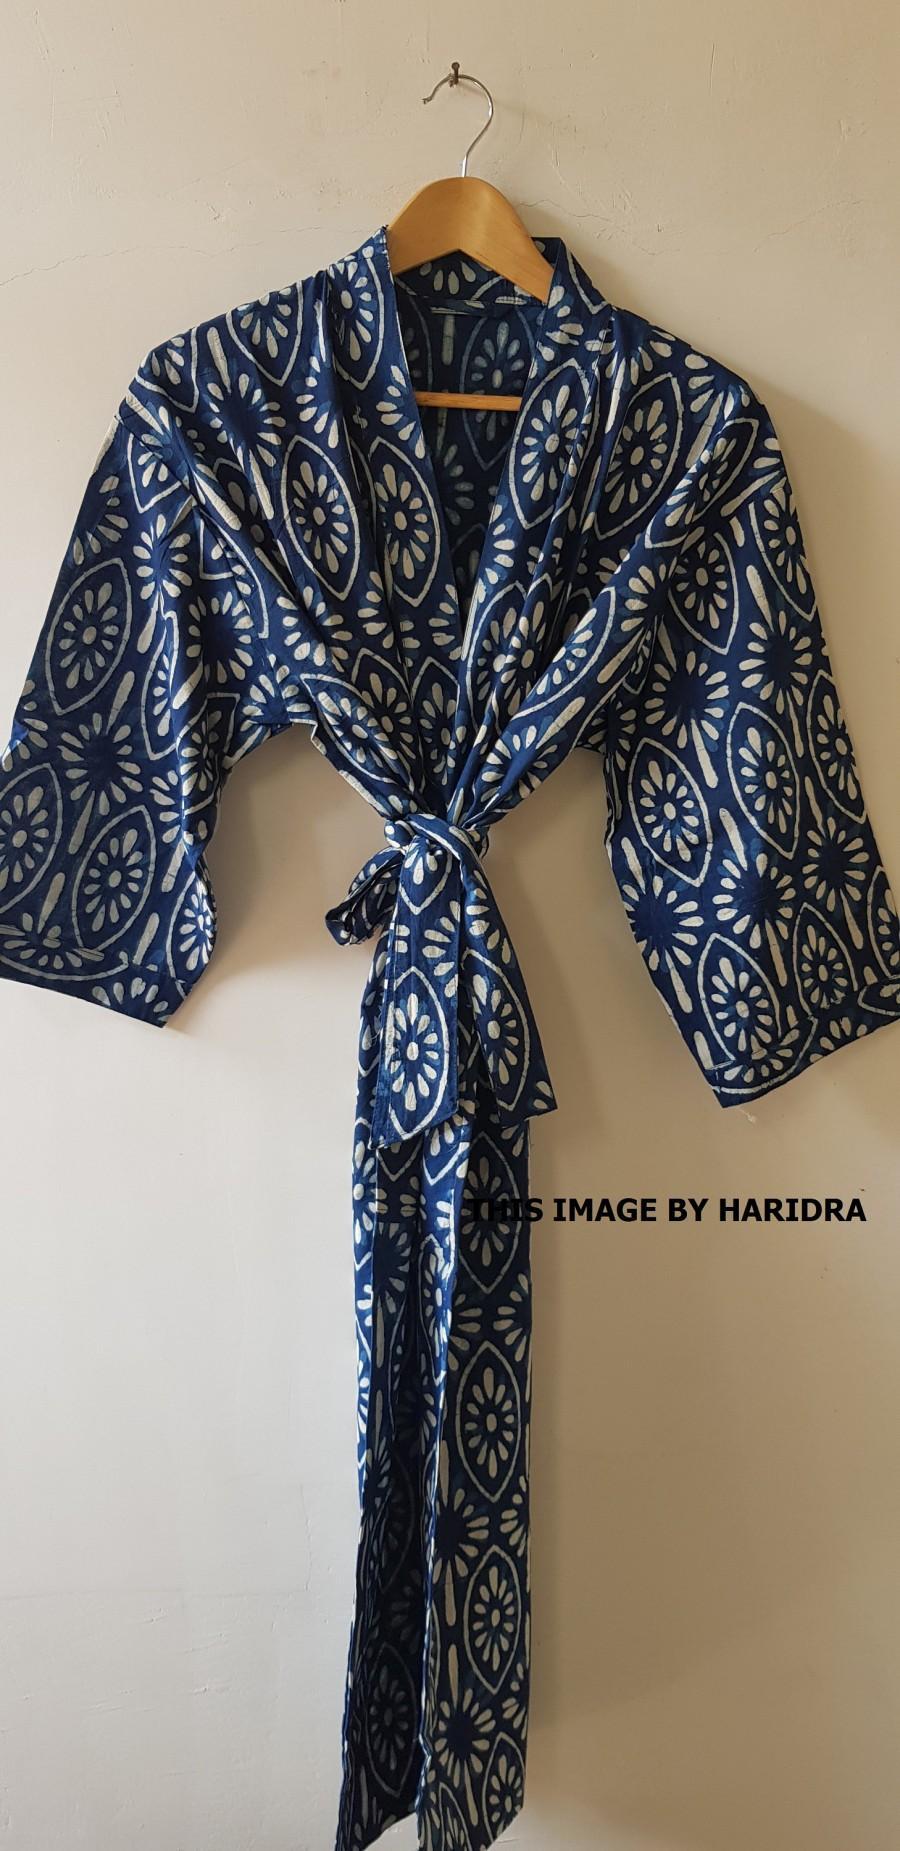 Свадьба - Blue and White Natural Dye Hand Block Printed Cotton Kimono, Womens Bath Robe, Indian Kimono Dress, Ladies Dress, Robe For Women, Beach Wear